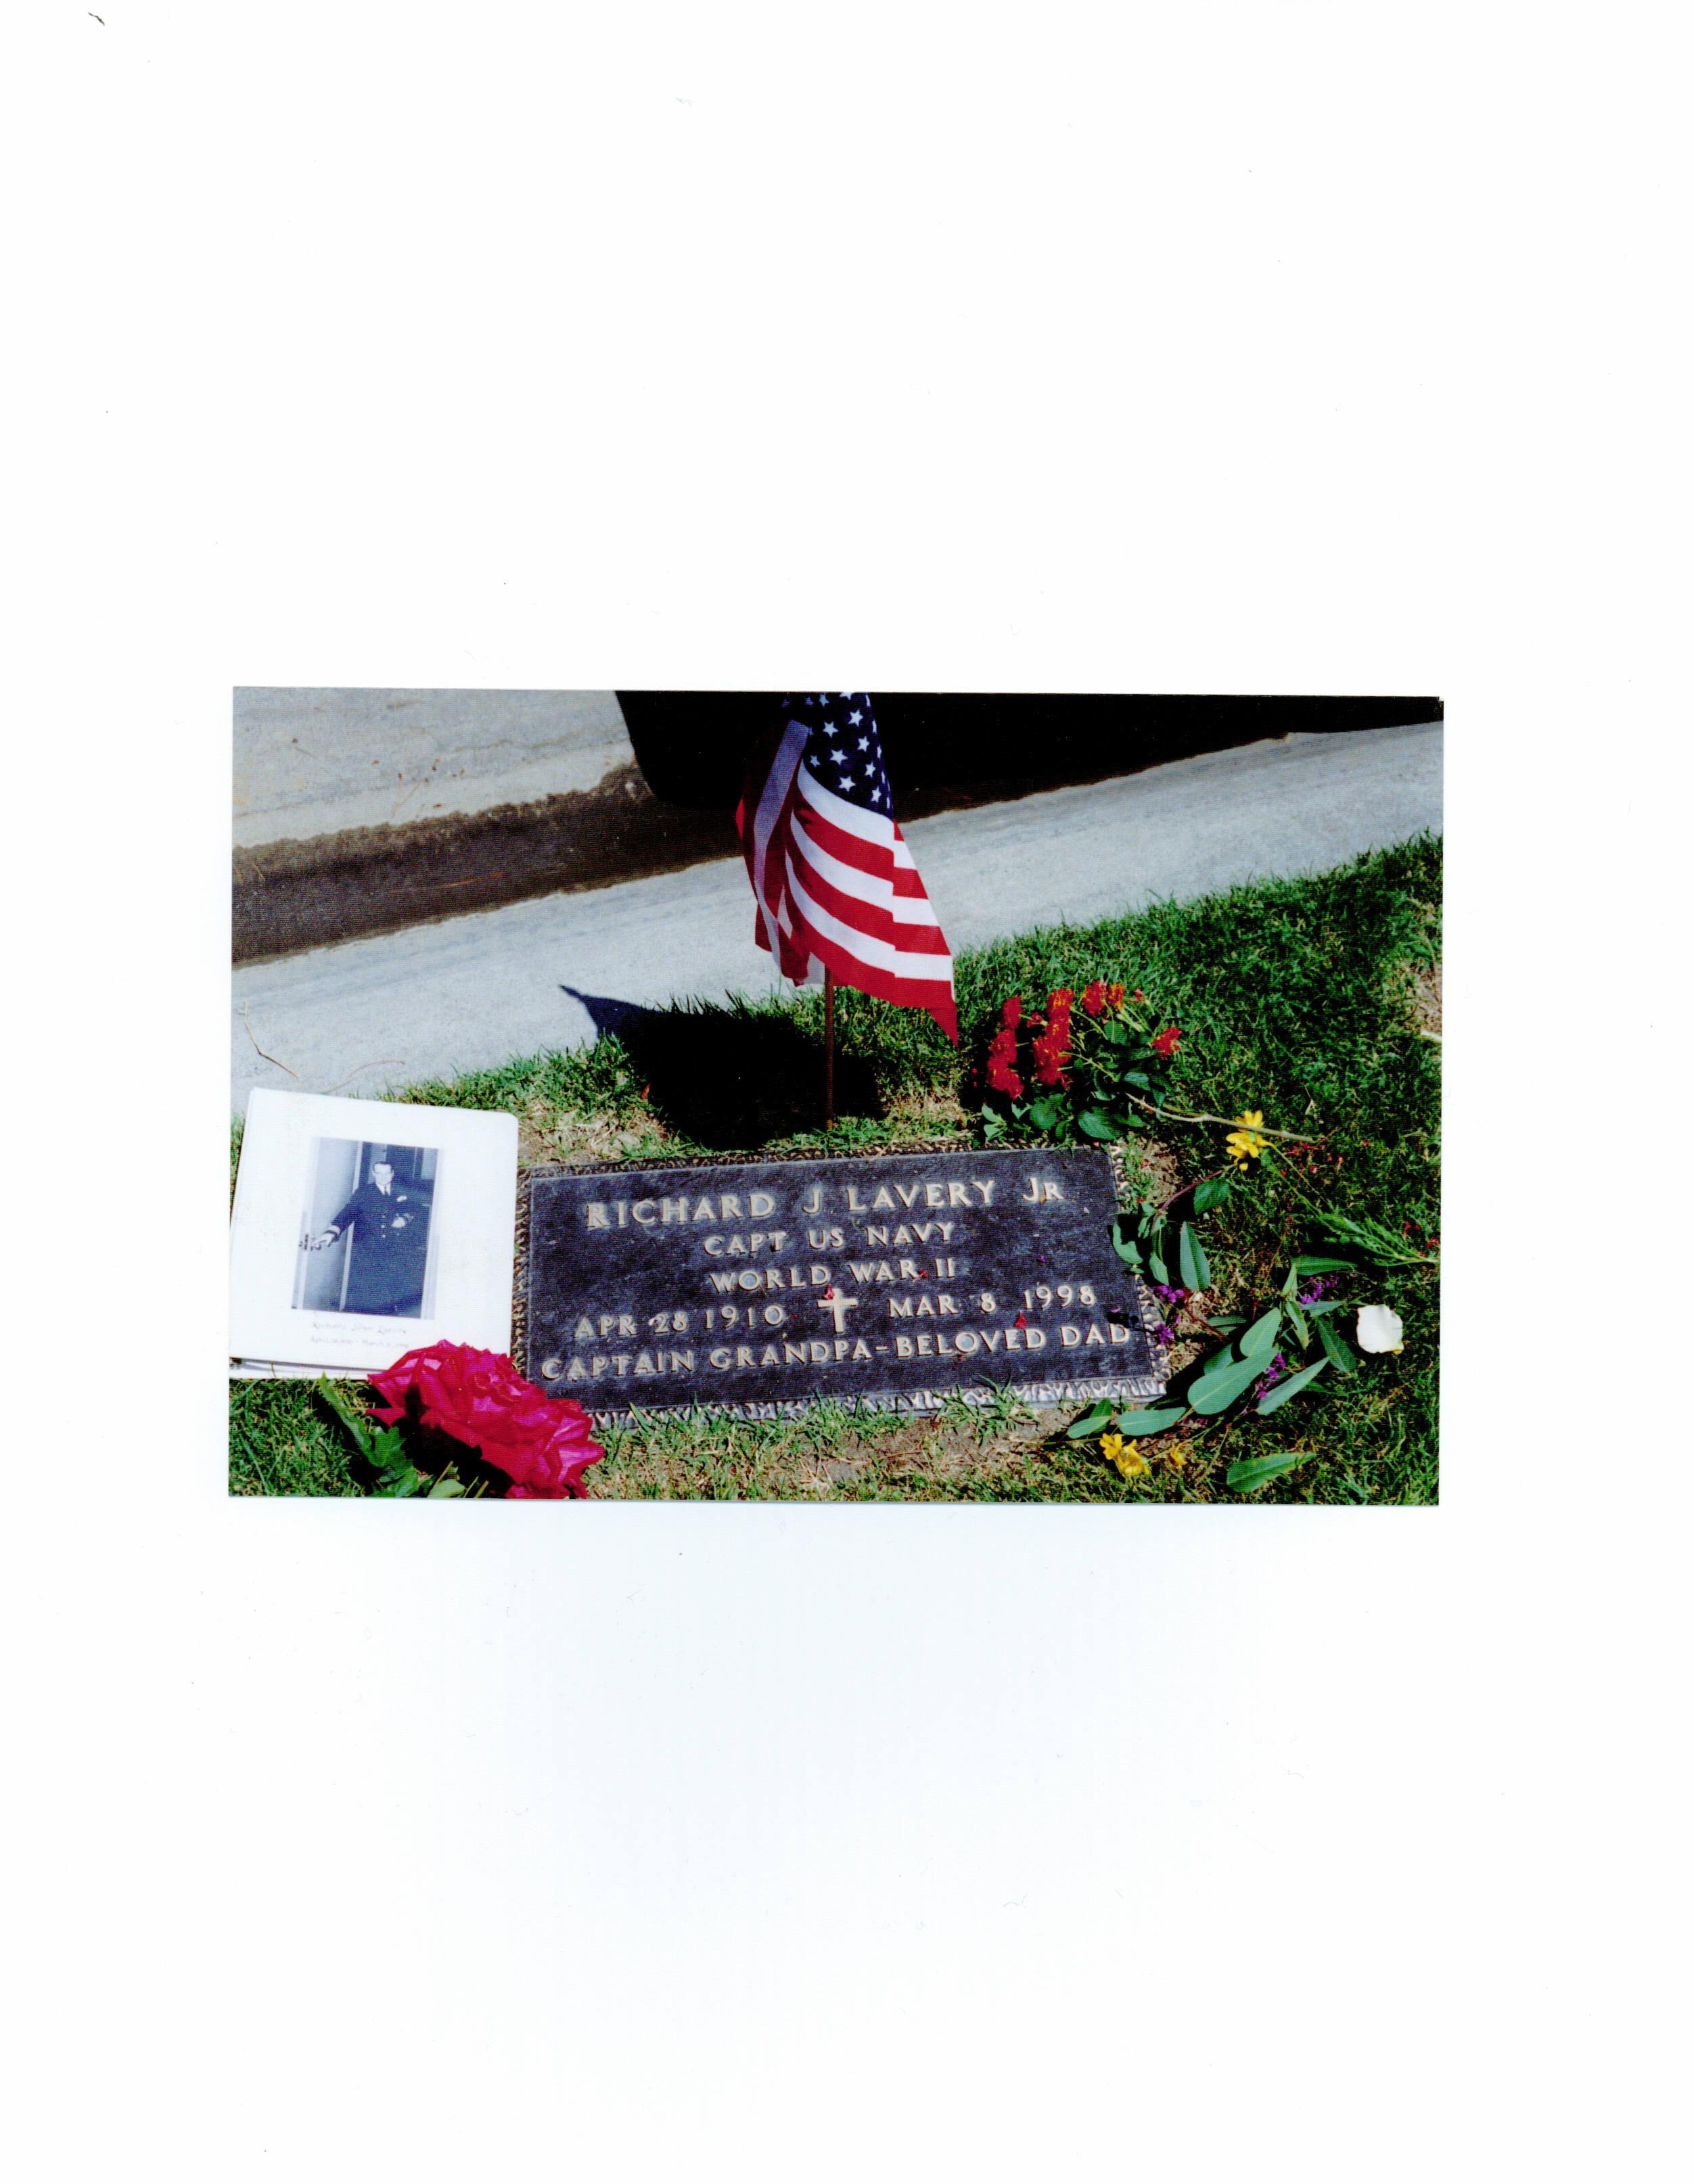 Dad's Memorial 4 28 09